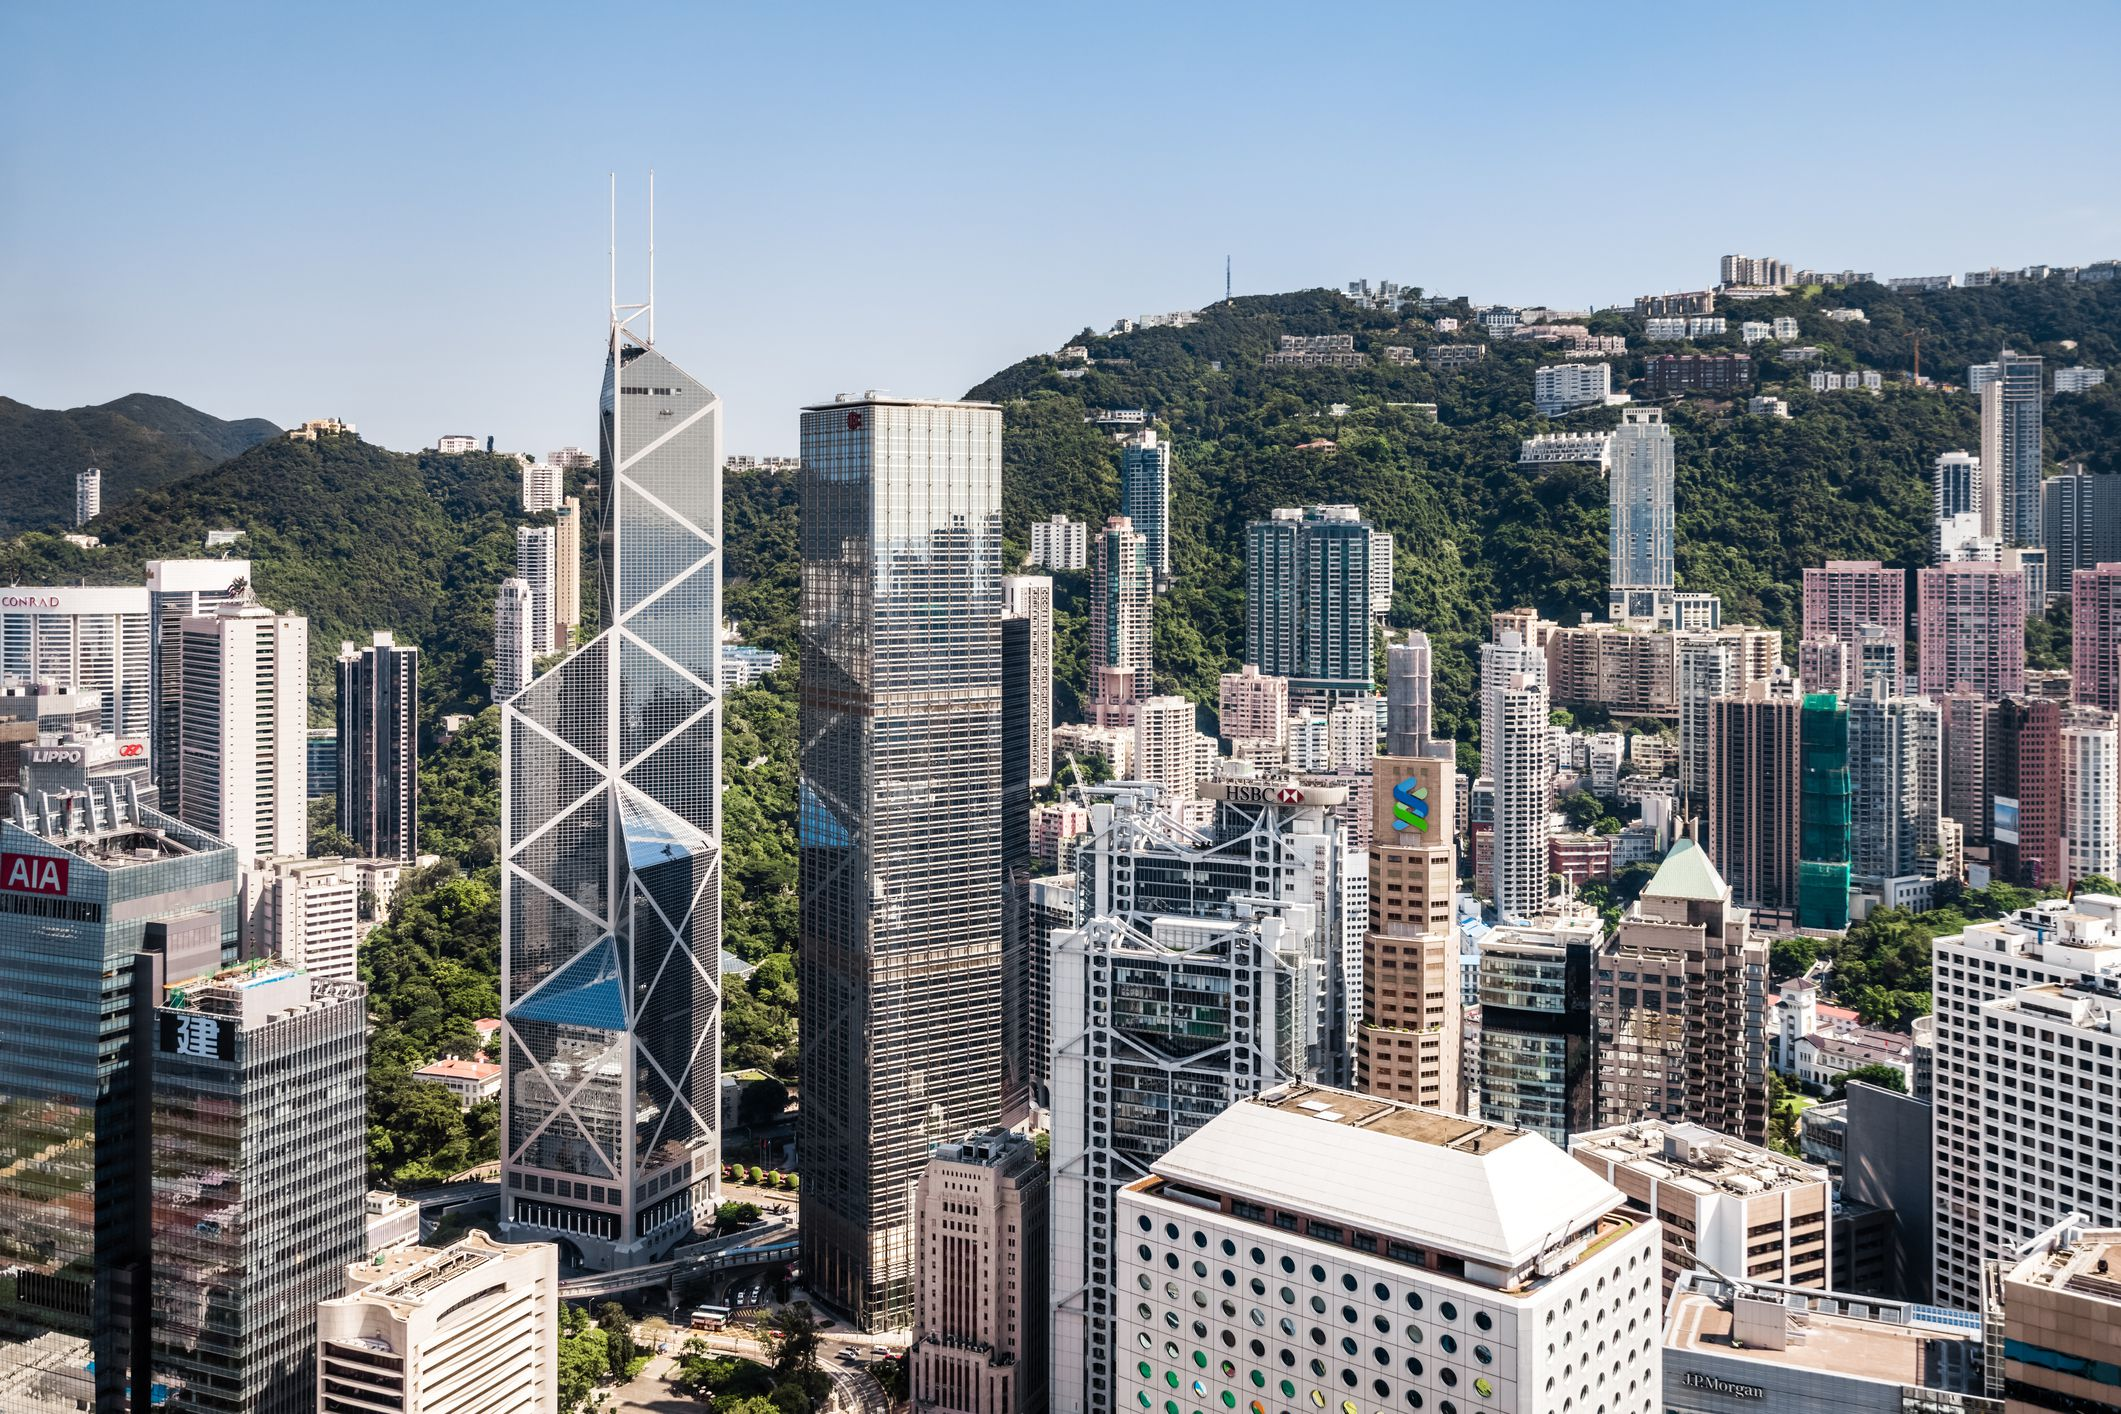 Vista elevada de rascacielos en Hong Kong